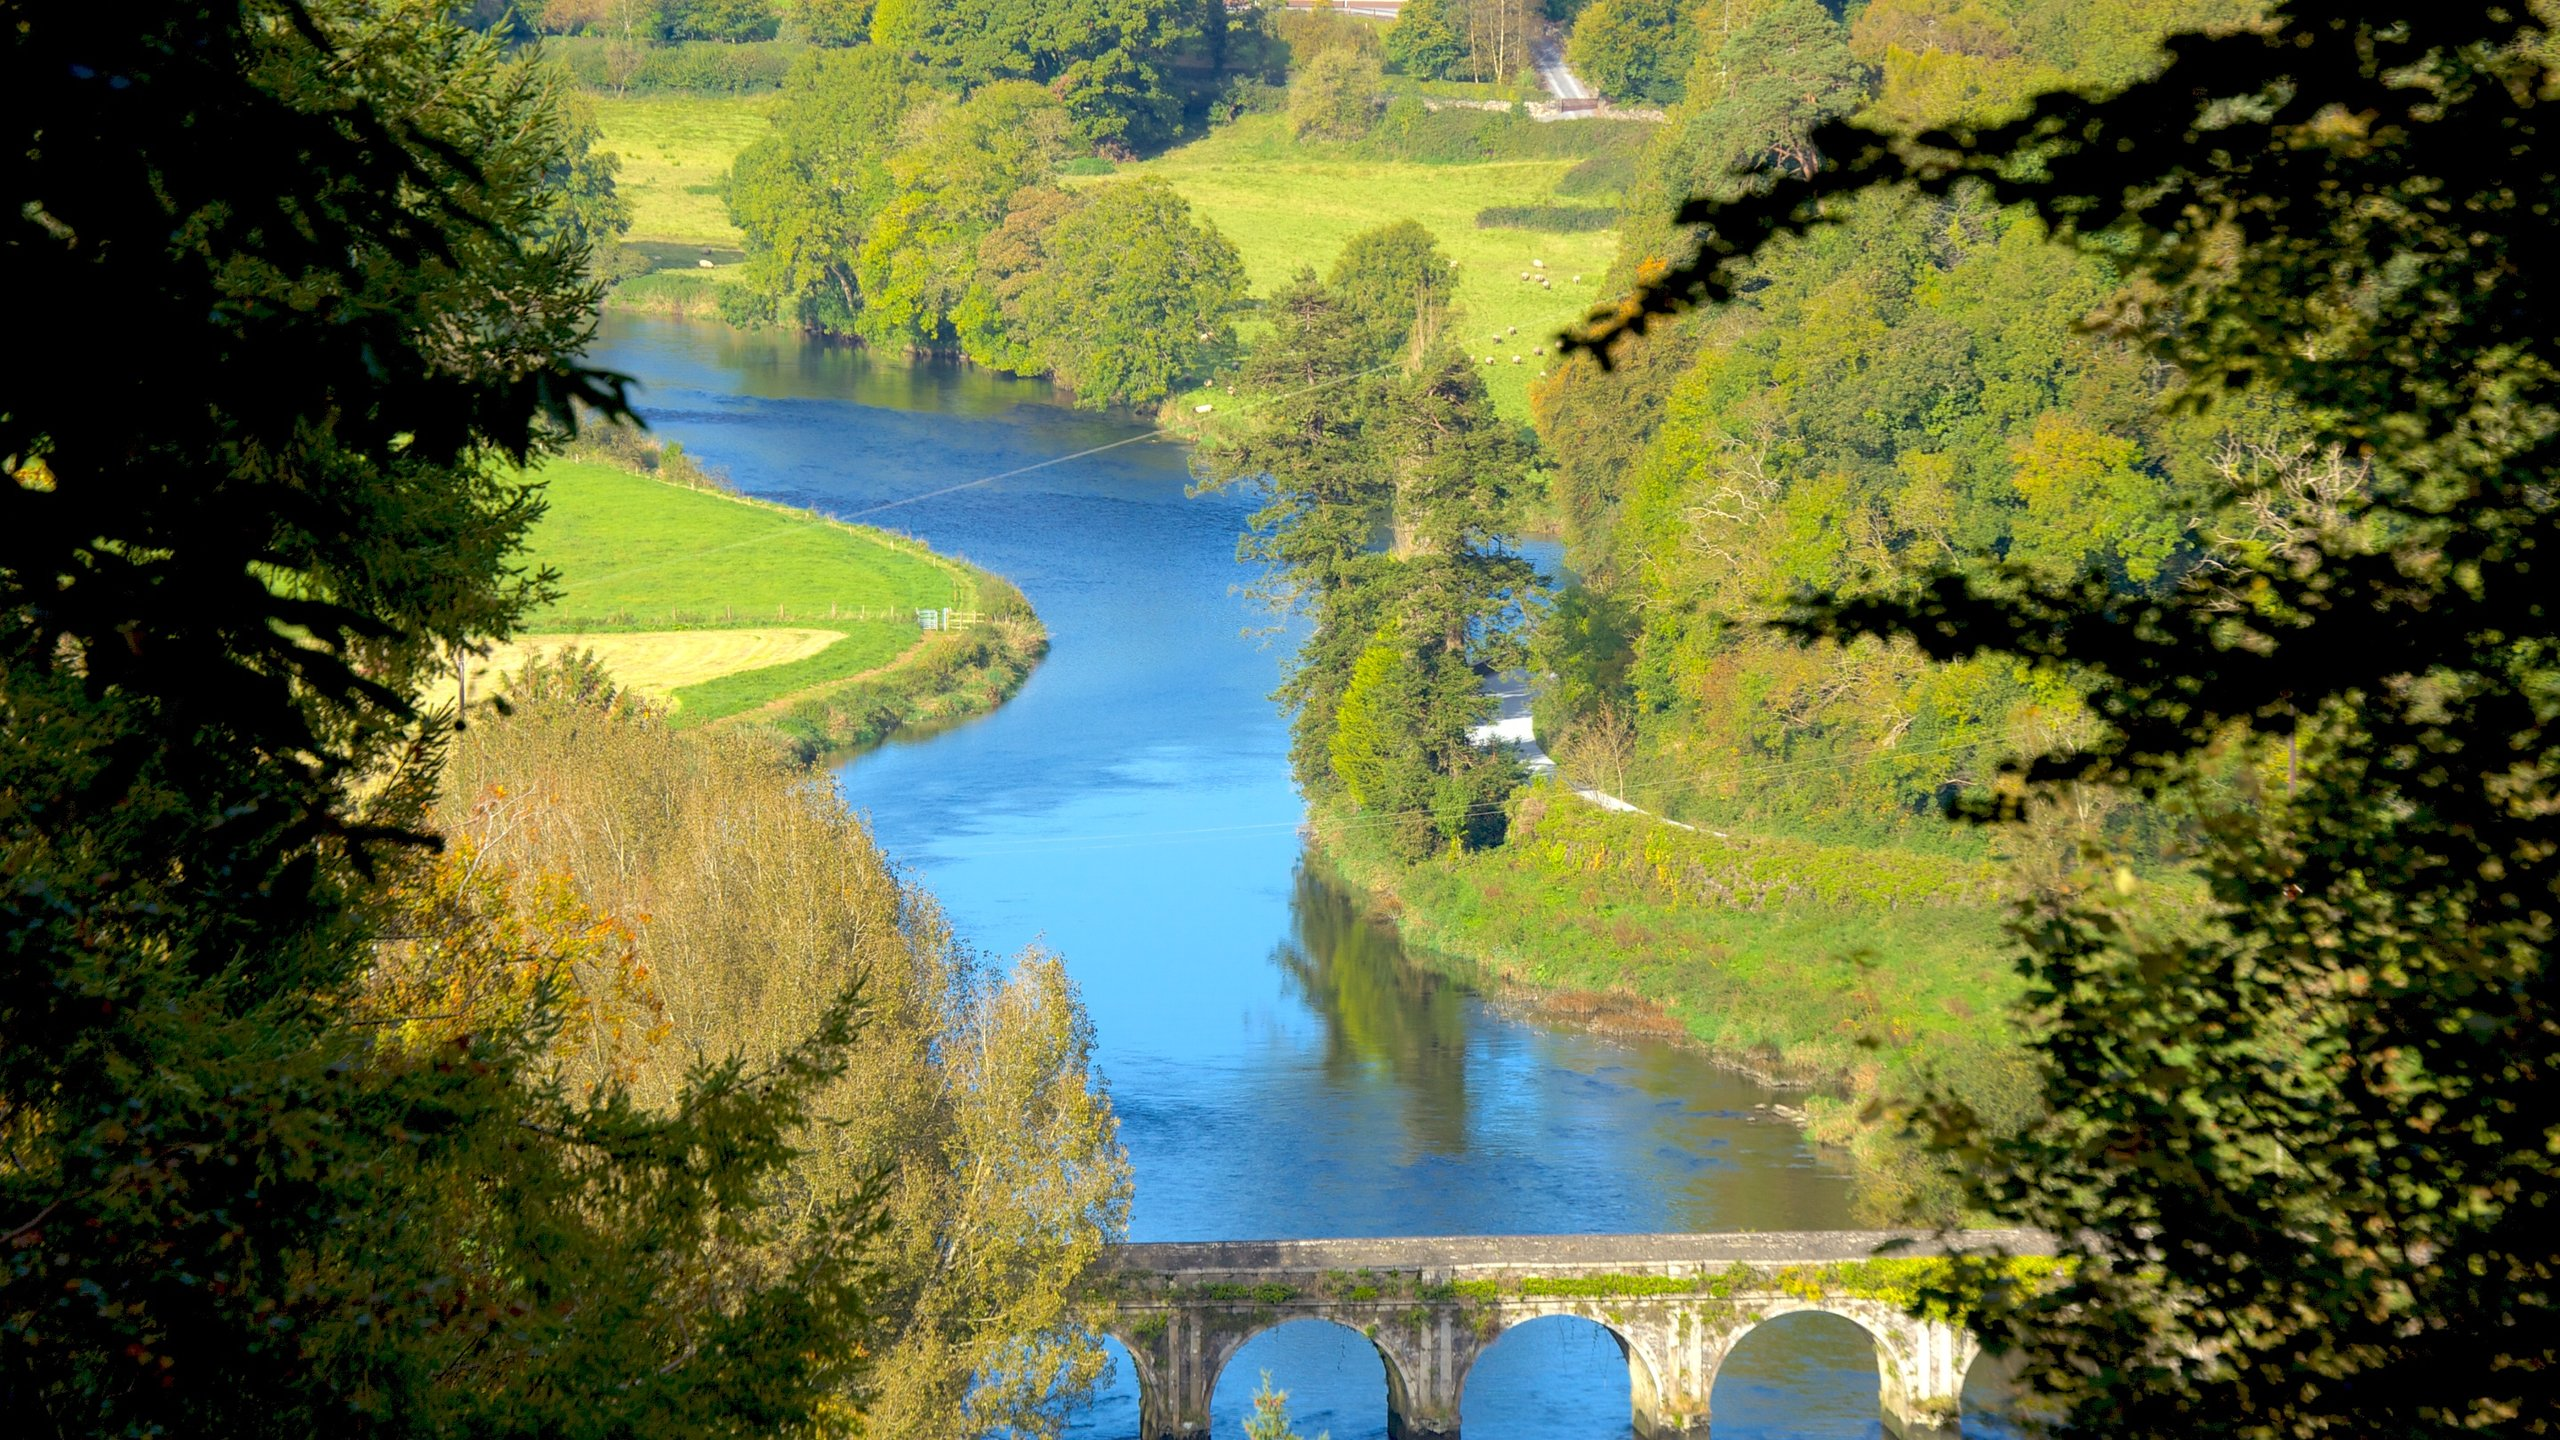 Inistioge, County Kilkenny, Ireland